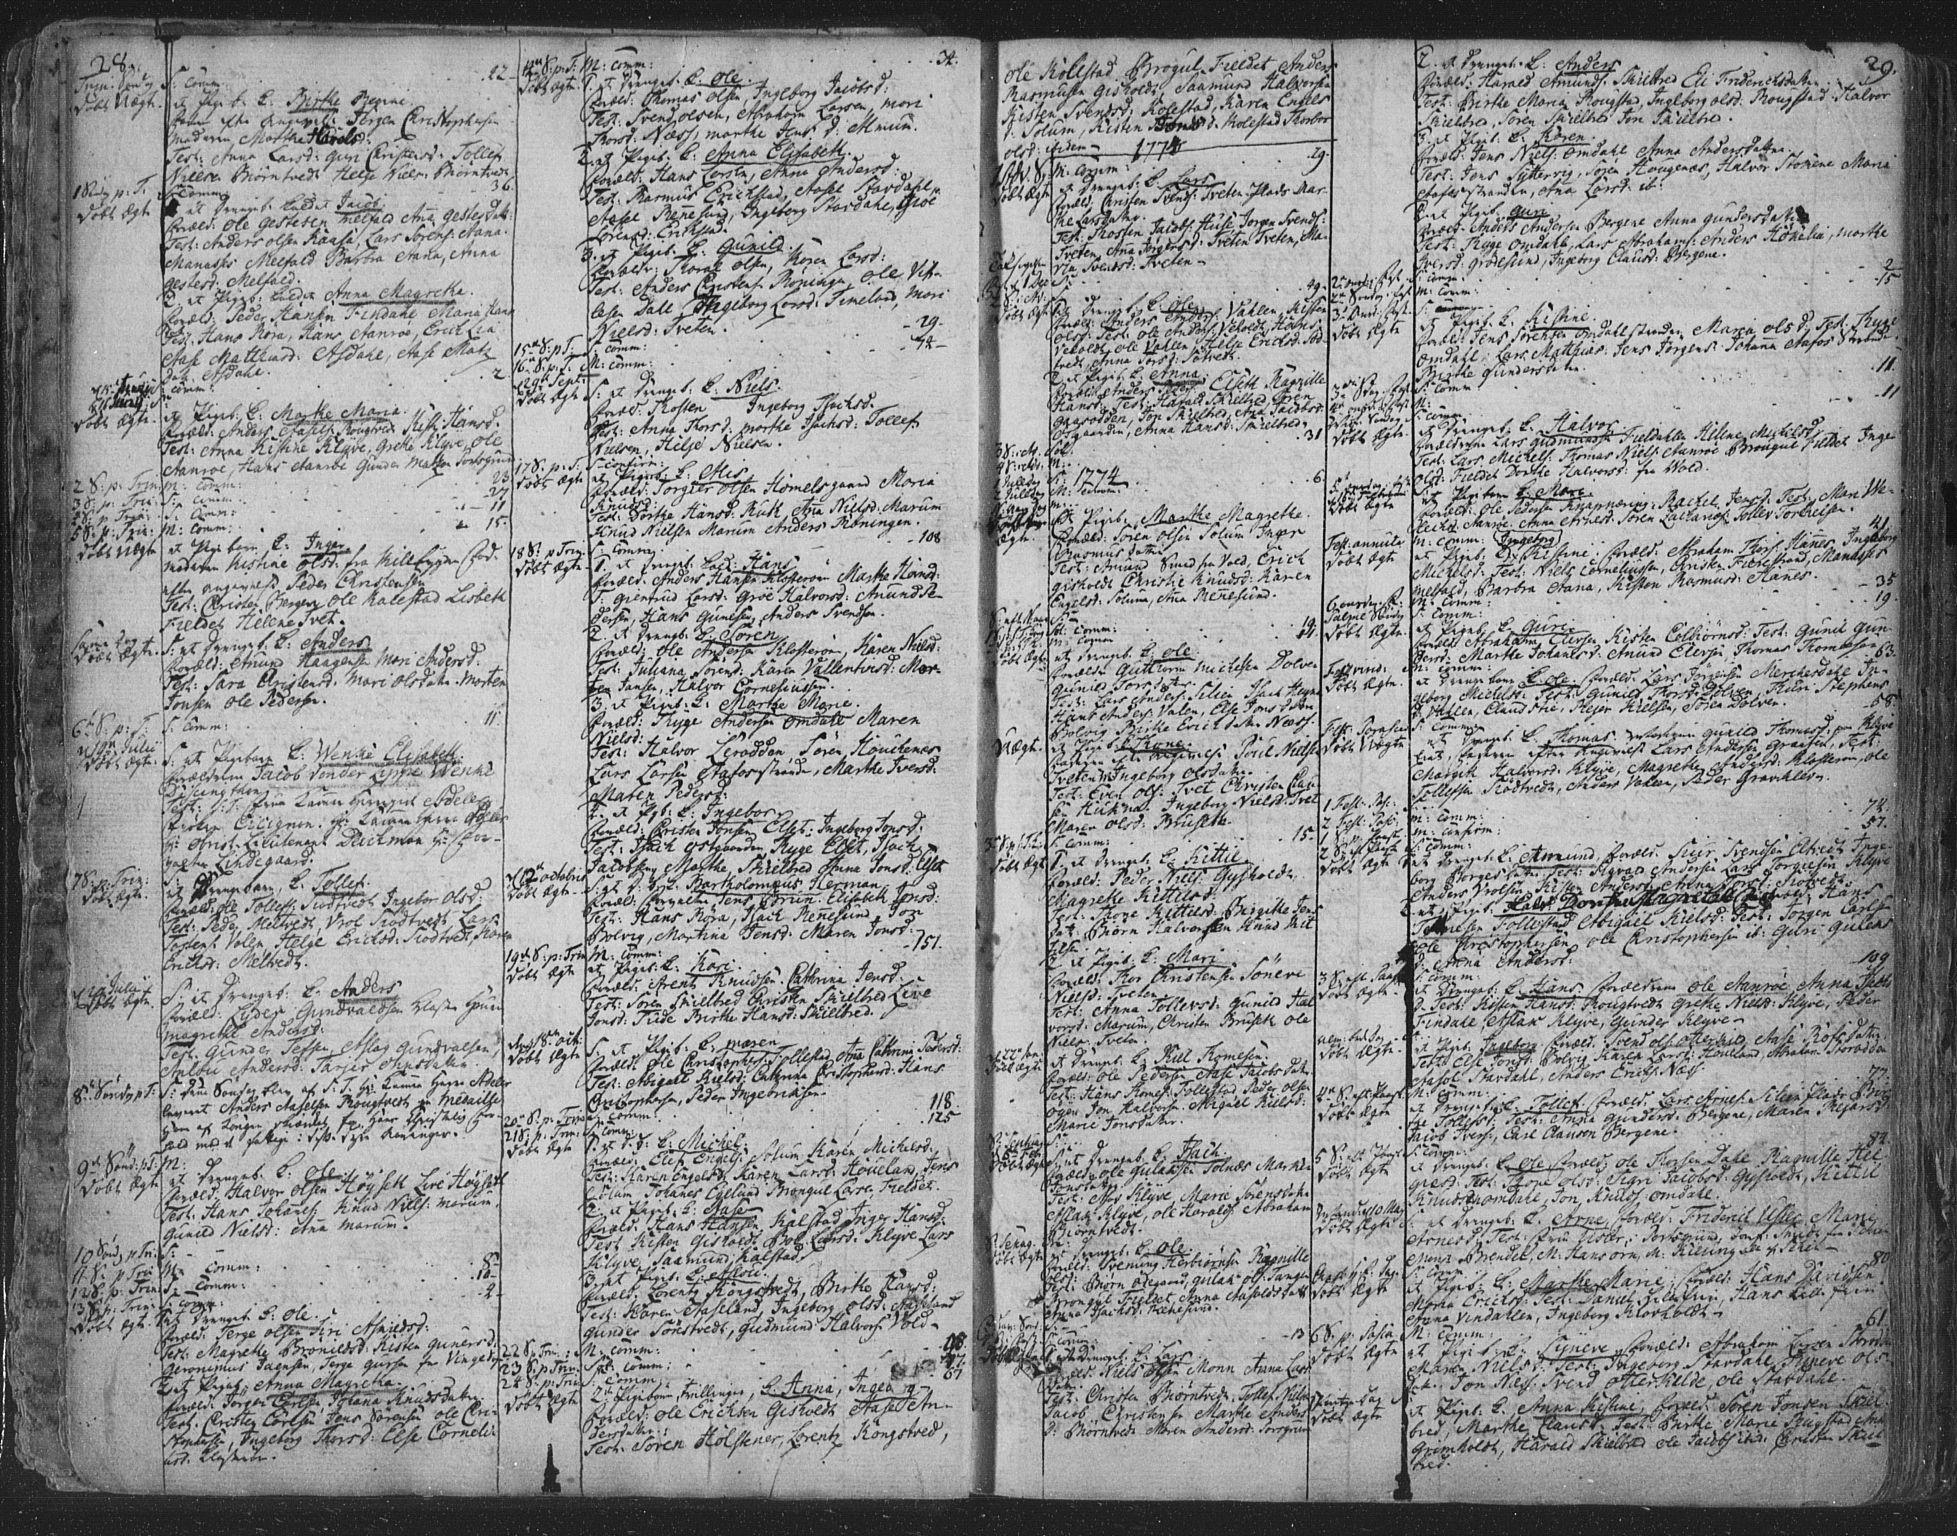 SAKO, Solum kirkebøker, F/Fa/L0003: Ministerialbok nr. I 3, 1761-1814, s. 28-29